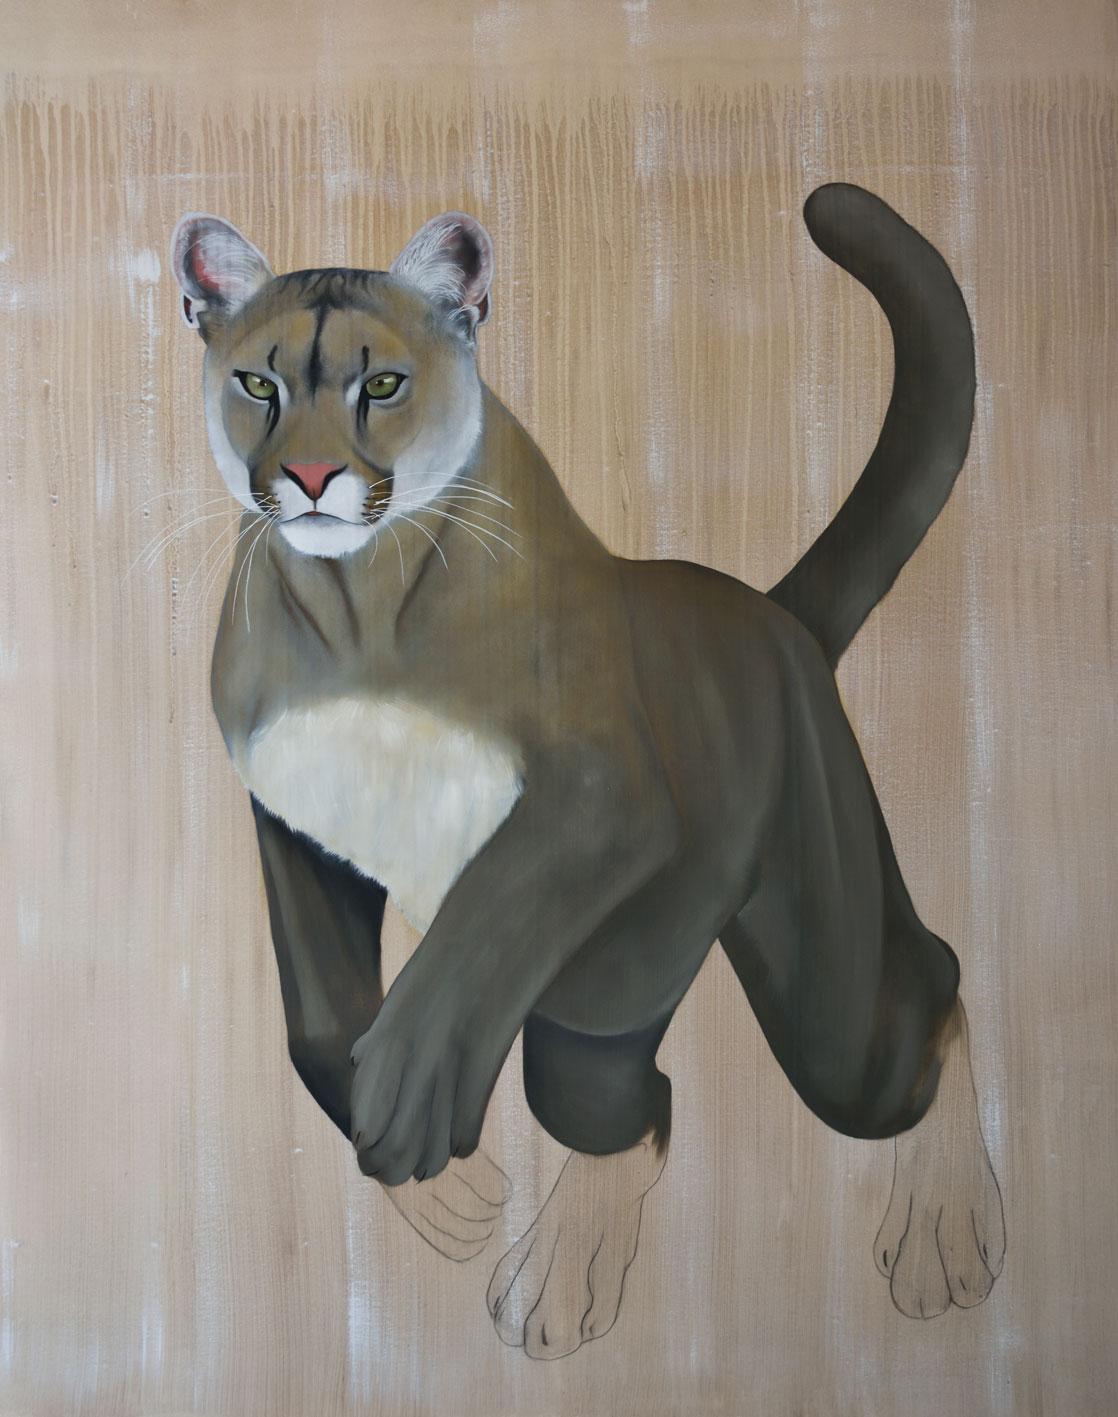 puma concolor coryi cougar puma thierry bisch animal painter